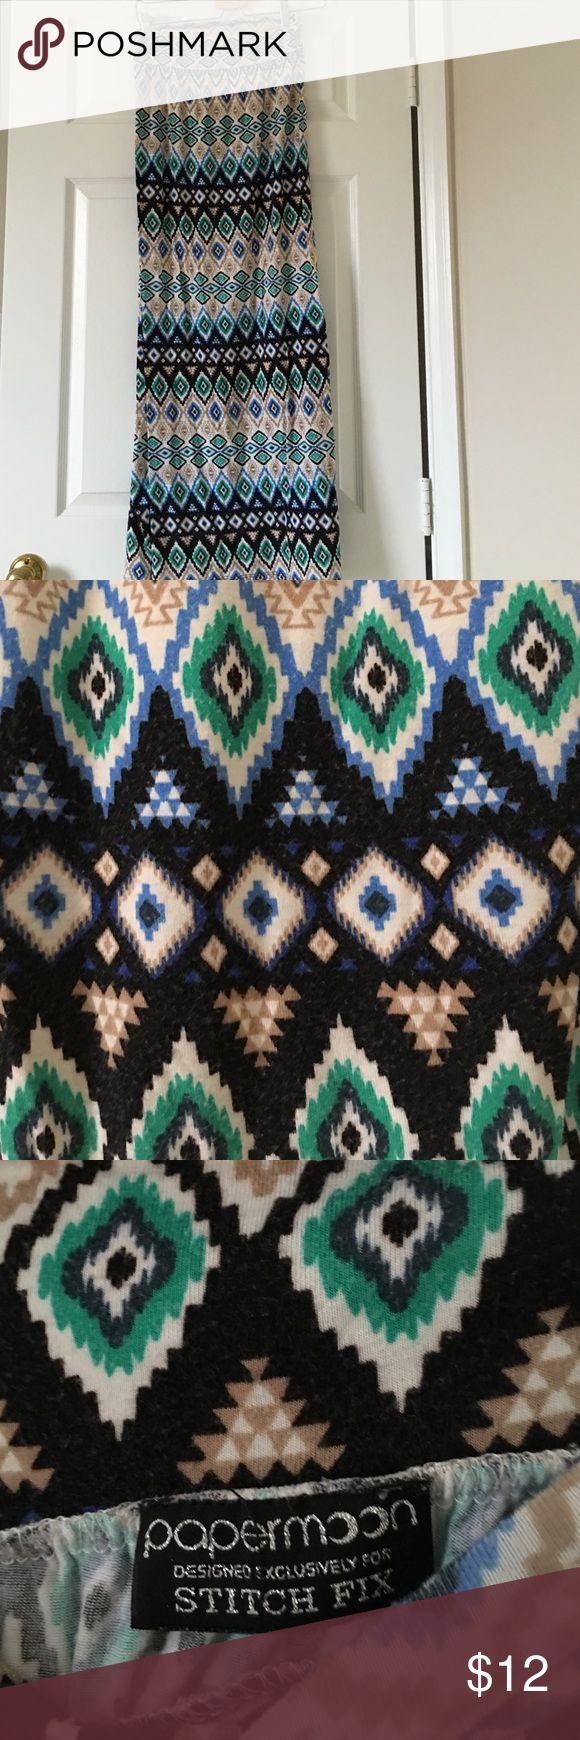 Paper moon stitch fix maxi skirt Size medium. Shows wash wear. Very comfy. Blue, green, brown, black ikat print. papermoon Skirts Maxi